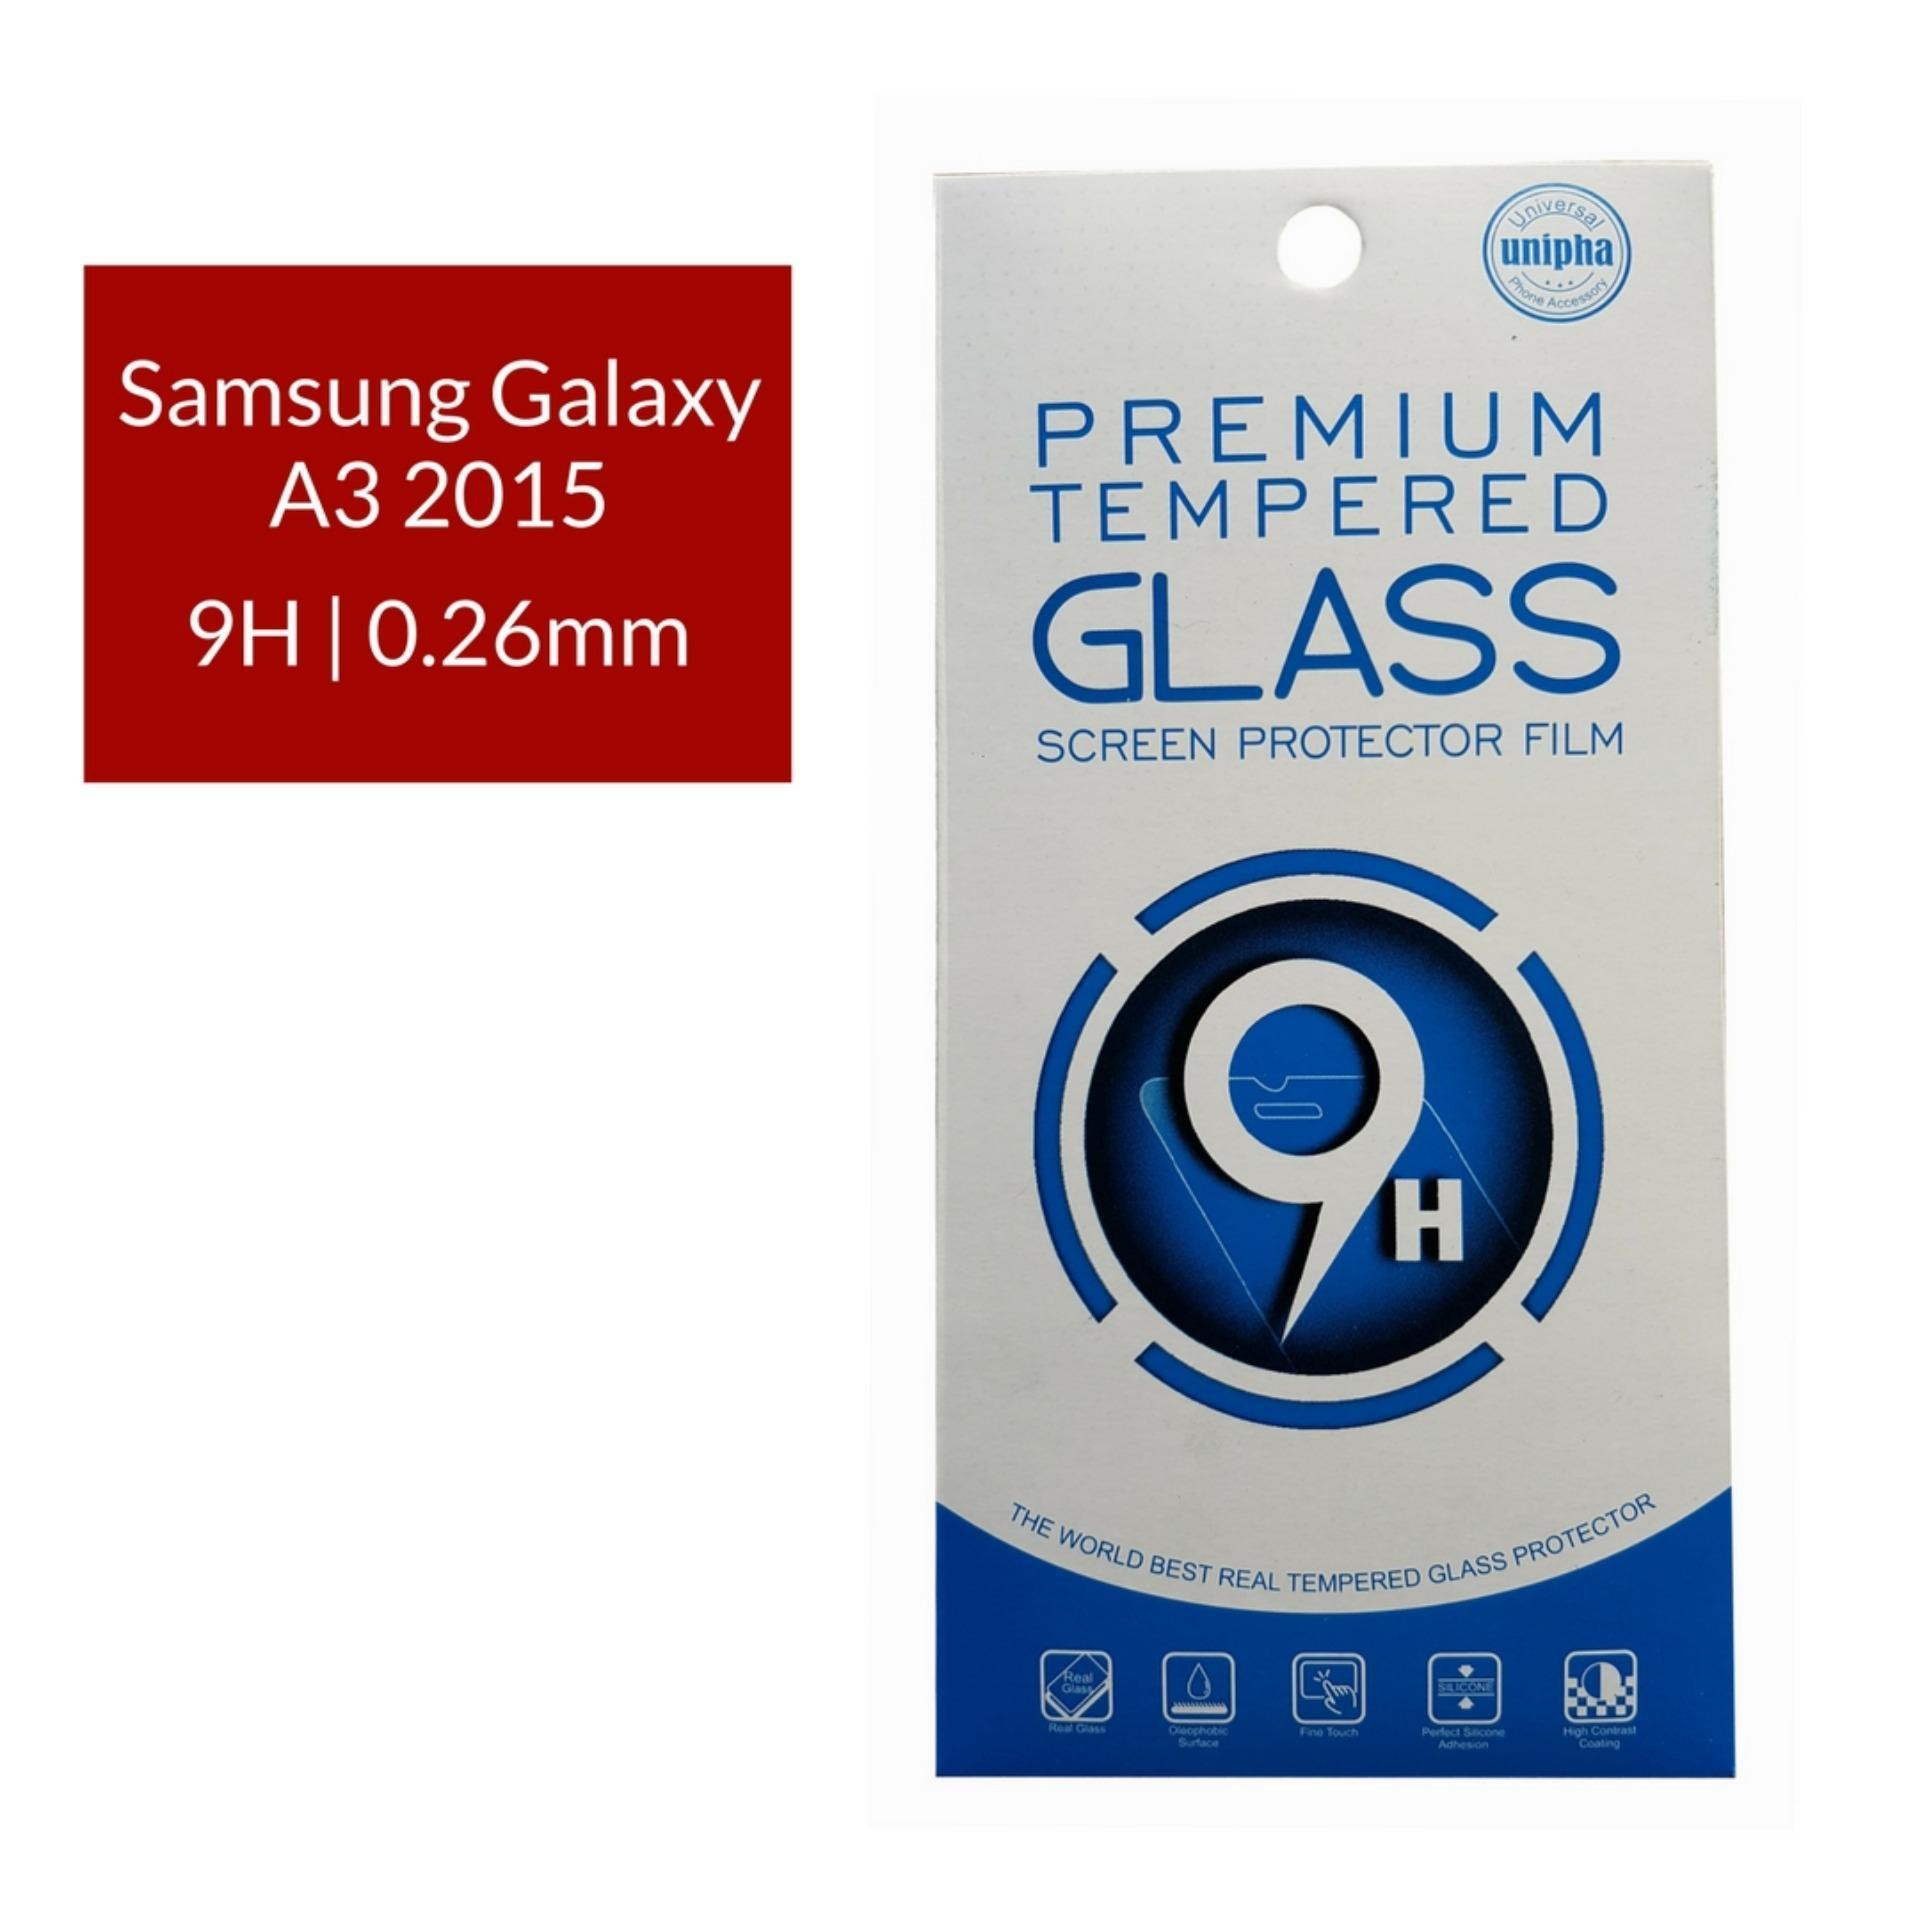 Unipha Premium Tempered Glass Screen Protector / Anti Gores Kaca Samsung Galaxy A3 2015 - Bening